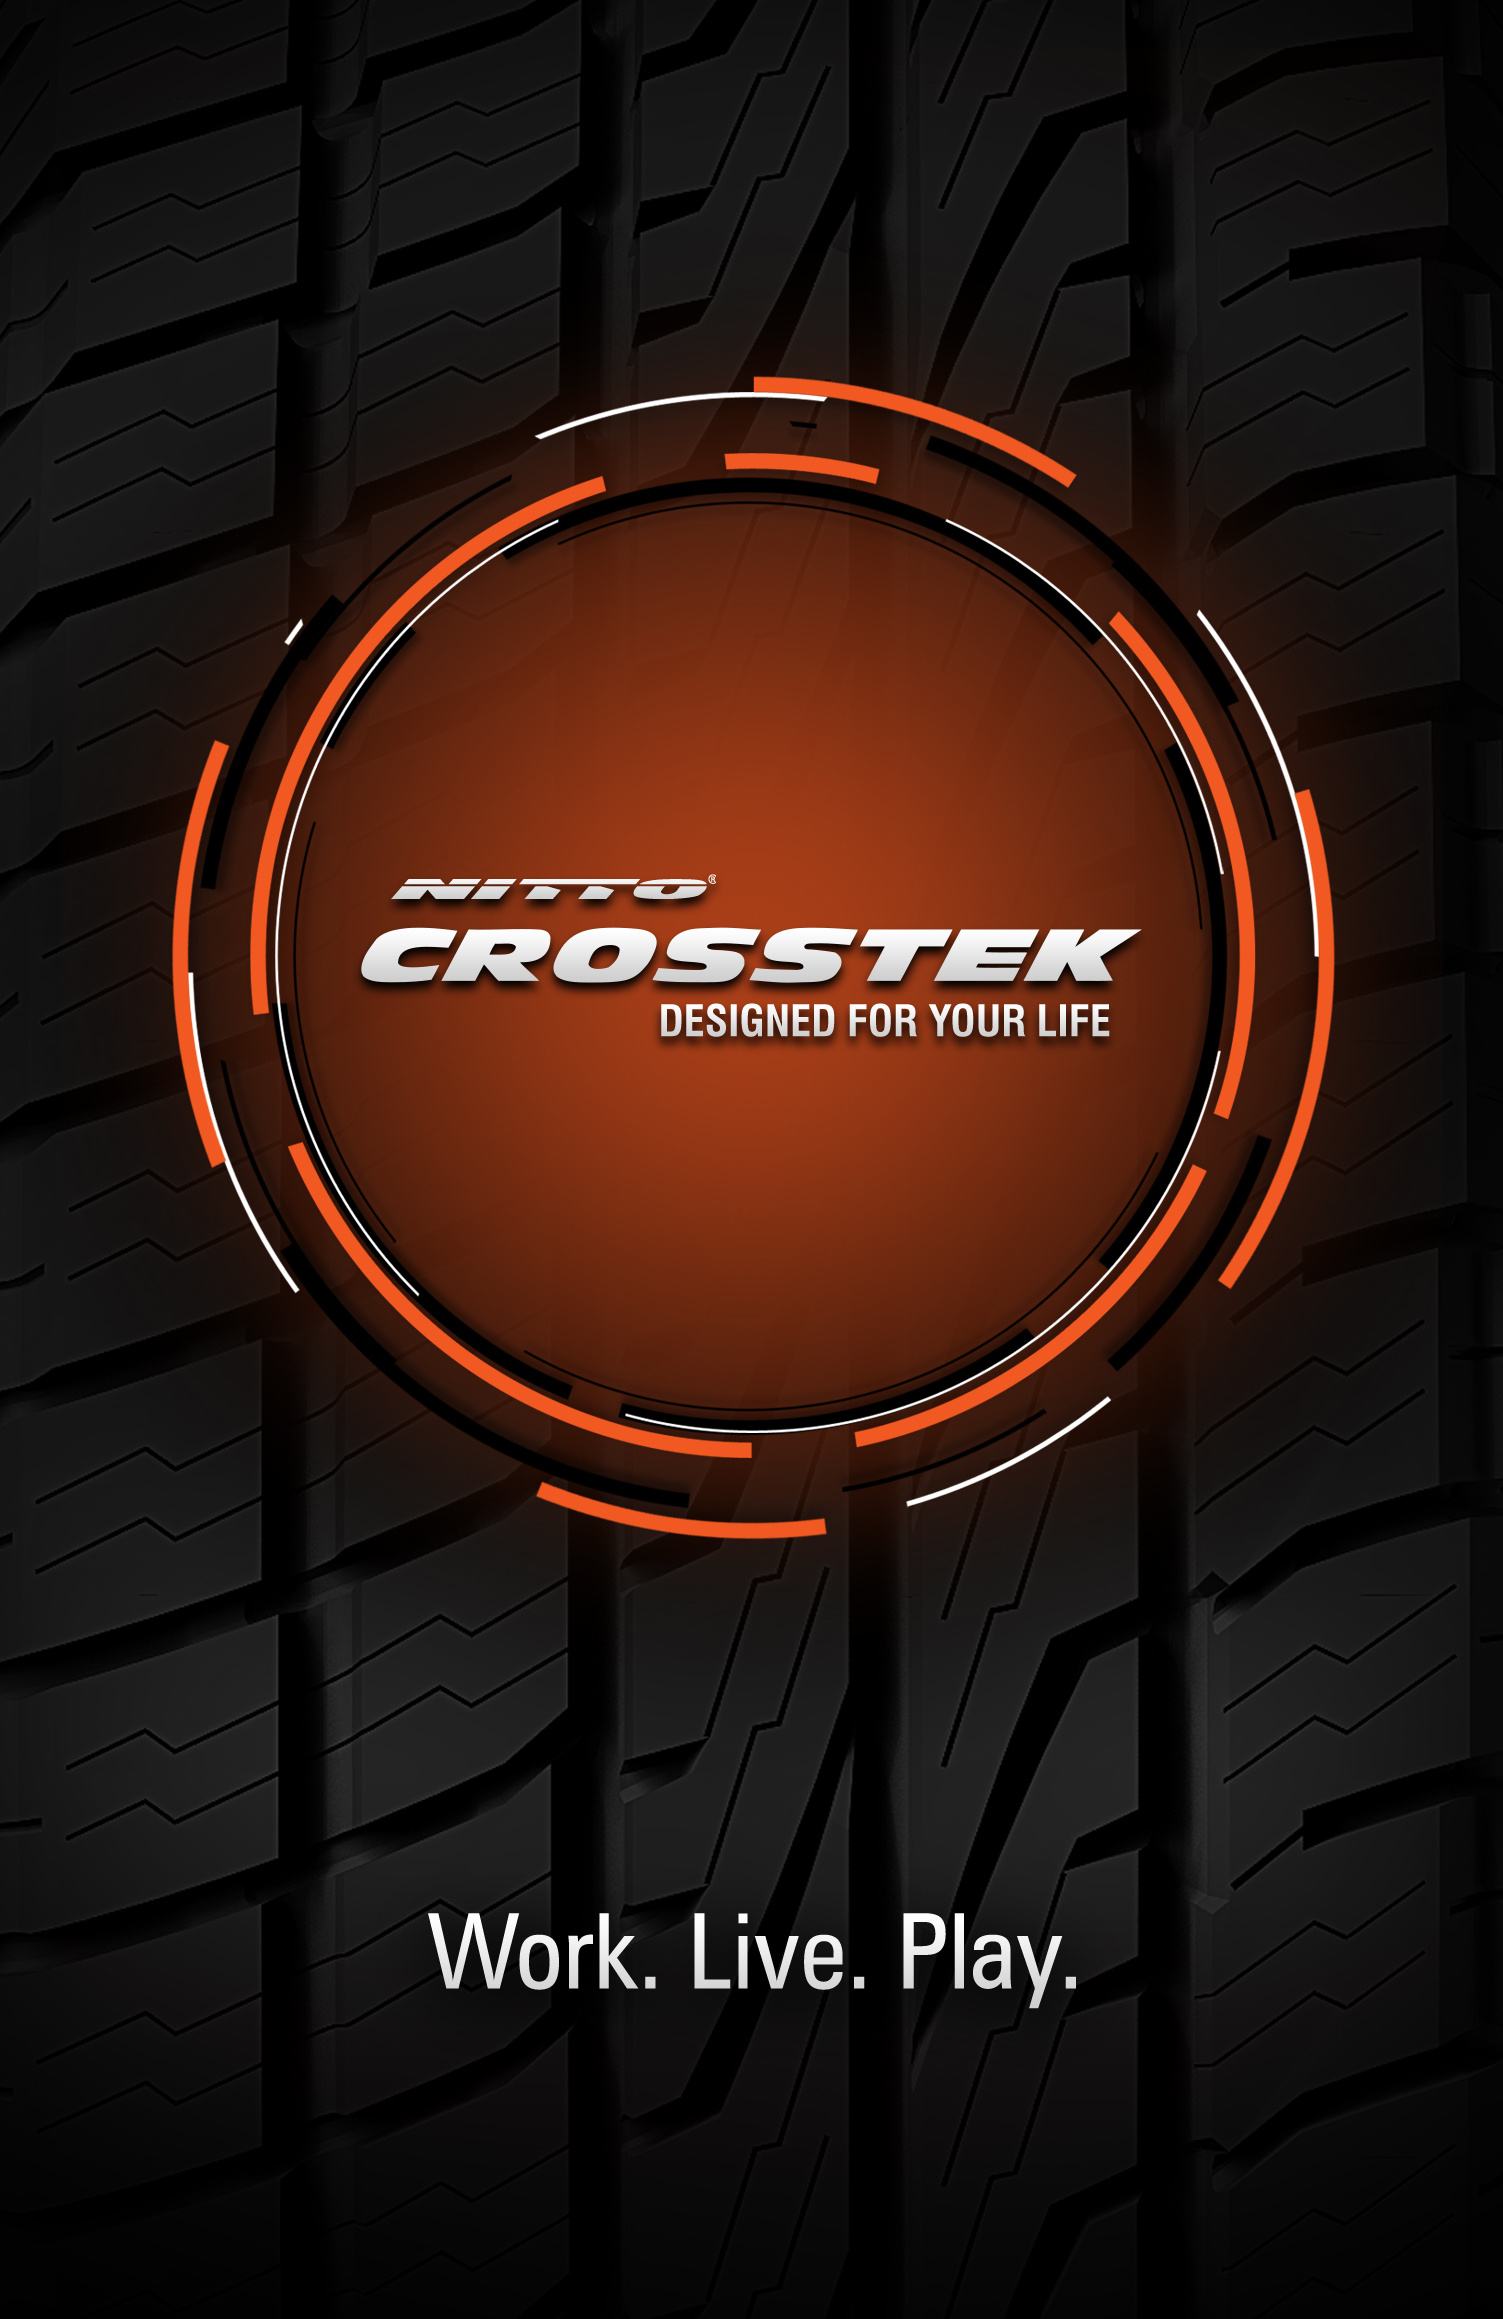 Crosstek_GalaxySkin04.jpg